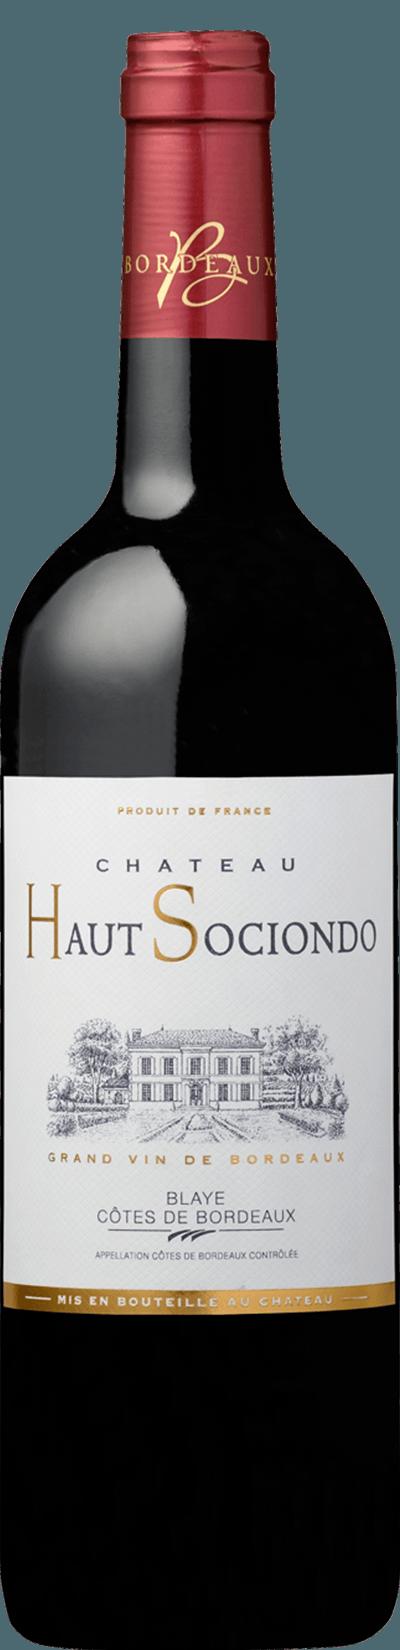 Château Haut Sociondo